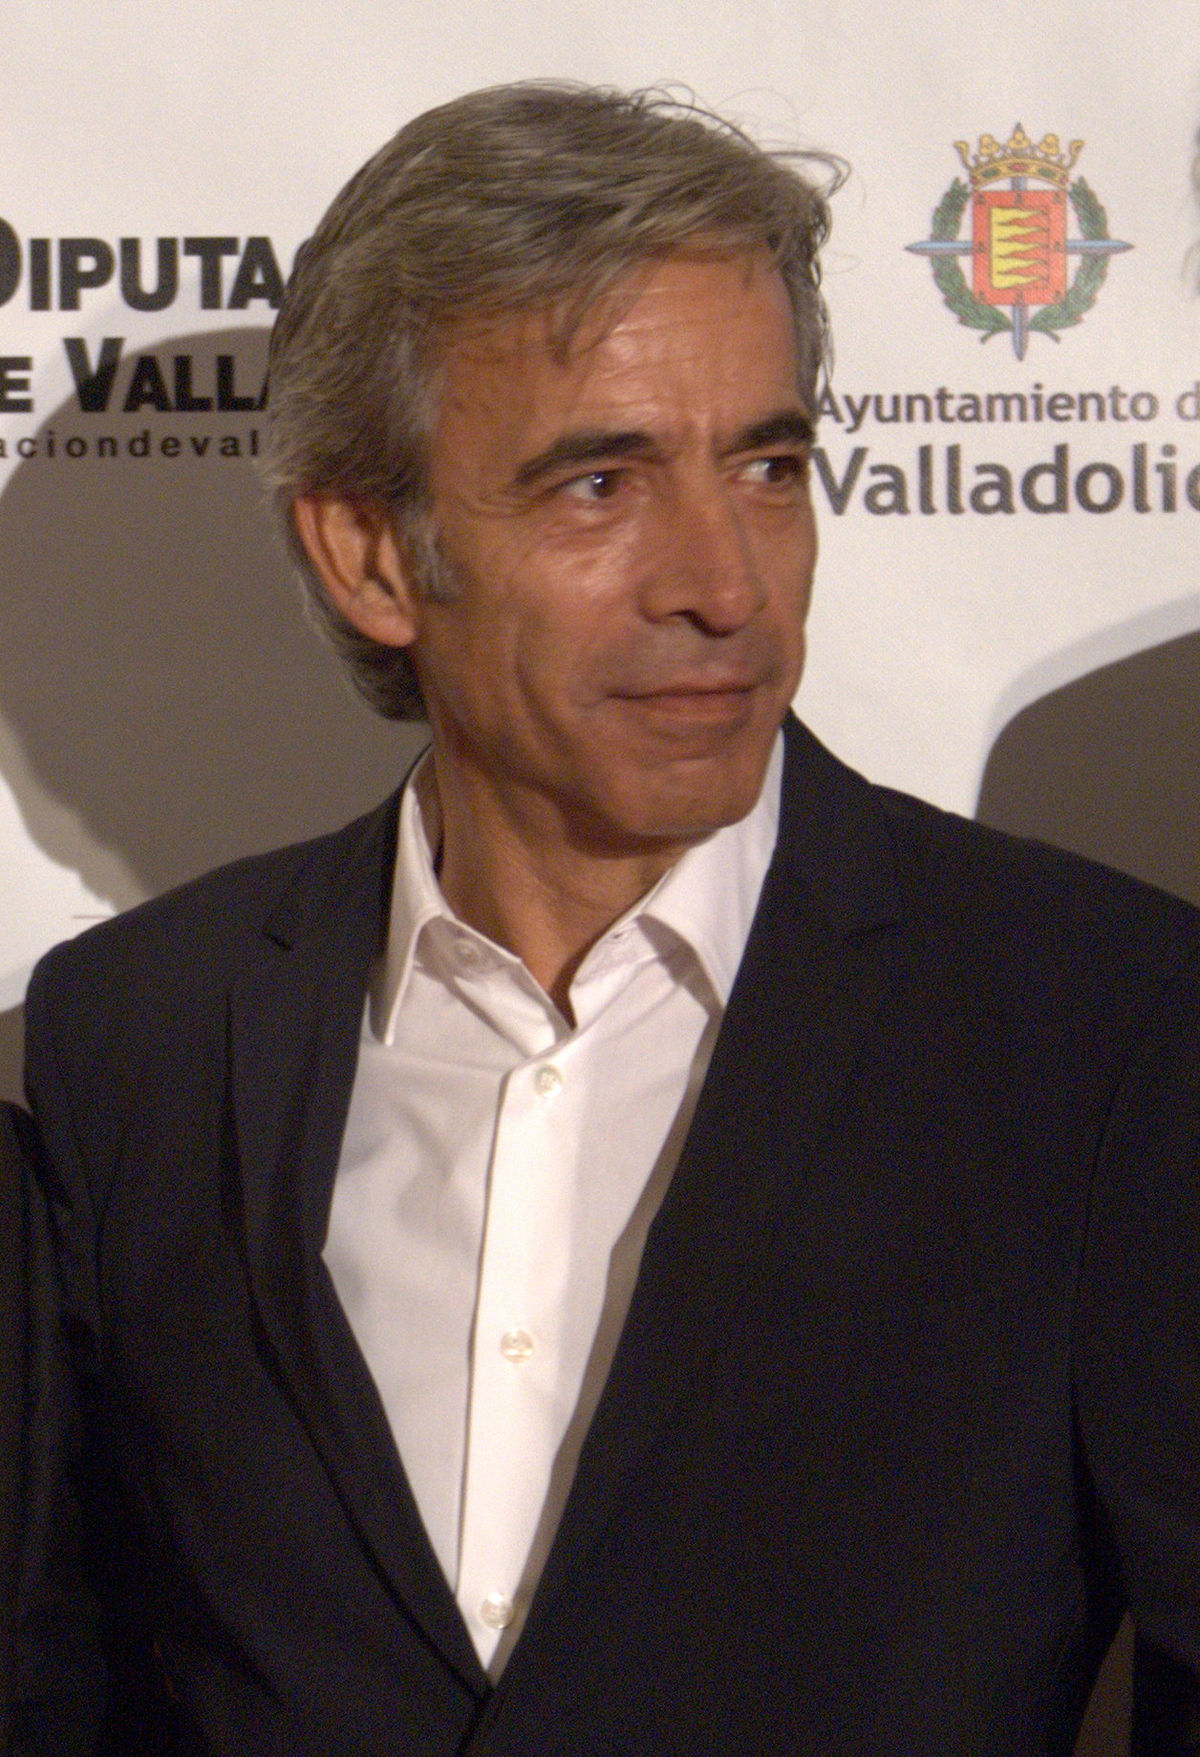 969ec6440f Antonio Alcántara - Wikipedia